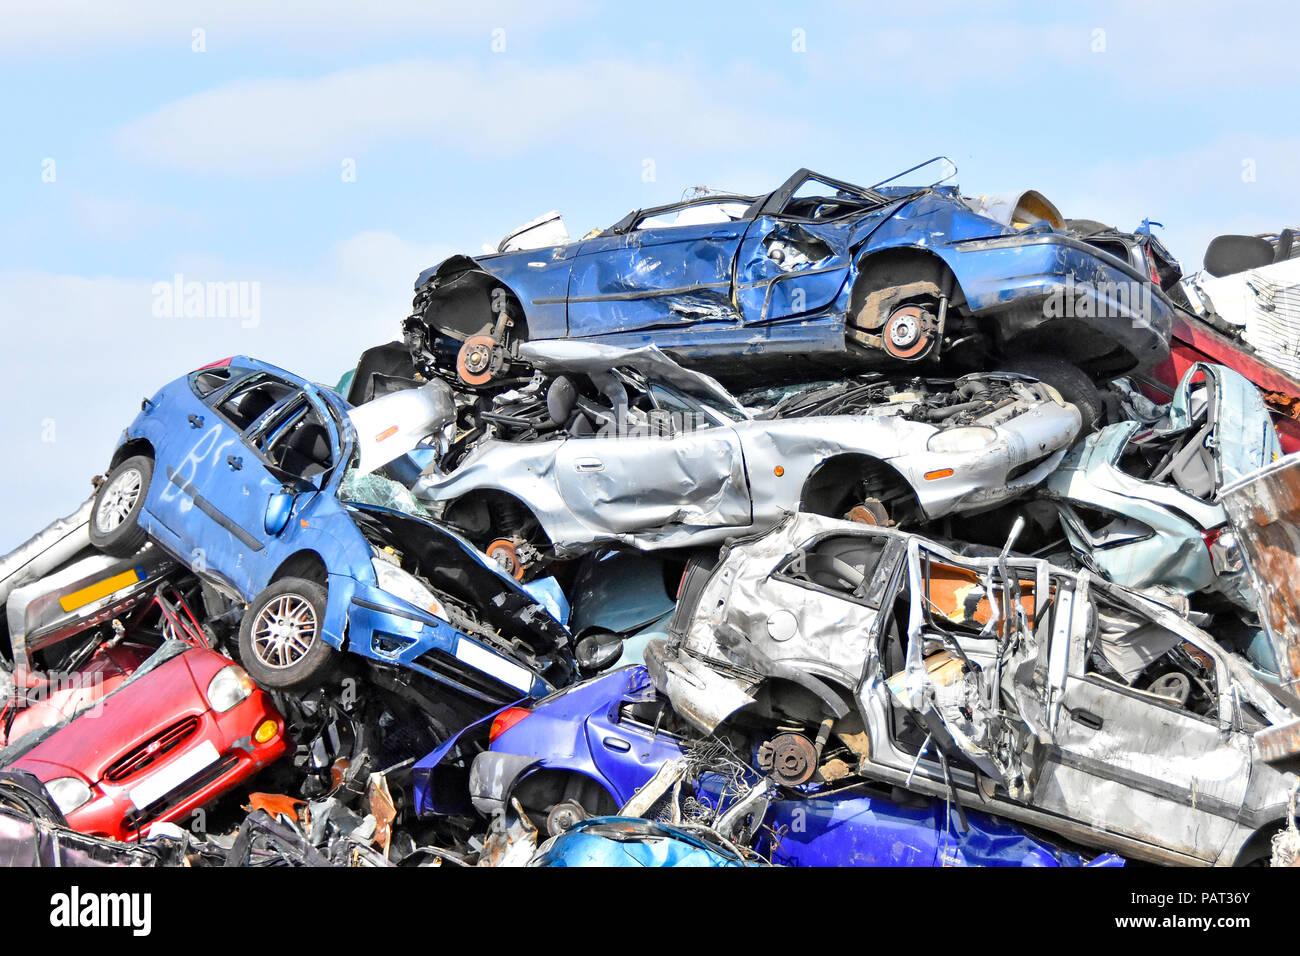 Cars at scrap metal business in recycling scrapyard smashed motor insurance written off car wreck in big heap awaiting crushing London England UK - Stock Image